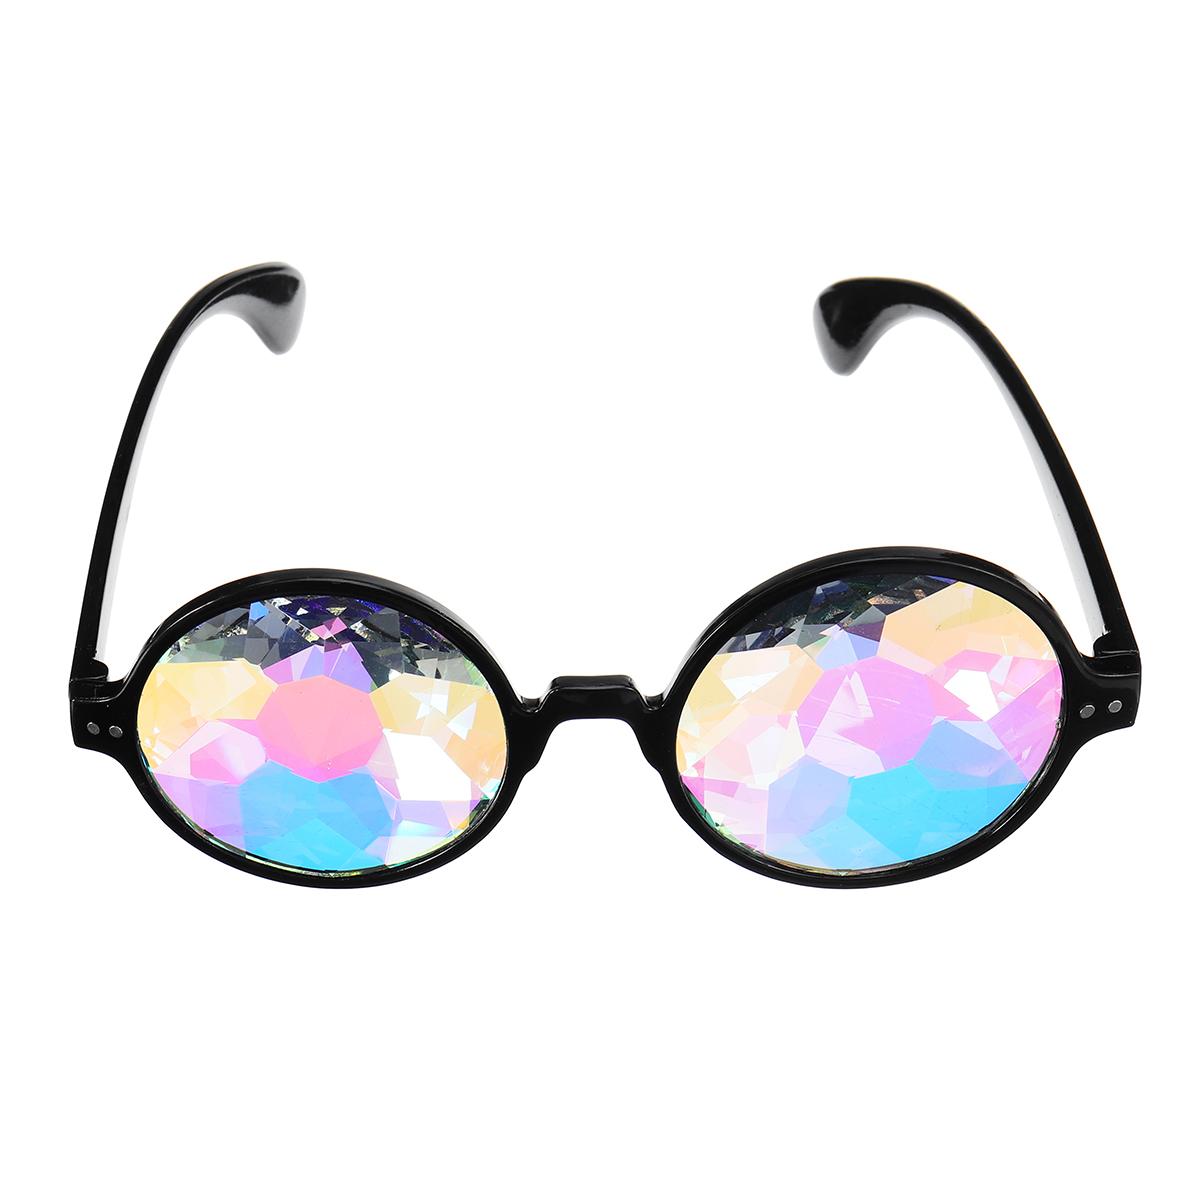 Unisex Party Kaleidoscope Glasses Glass Lens Costume Eyes Mirrored Retro Frame